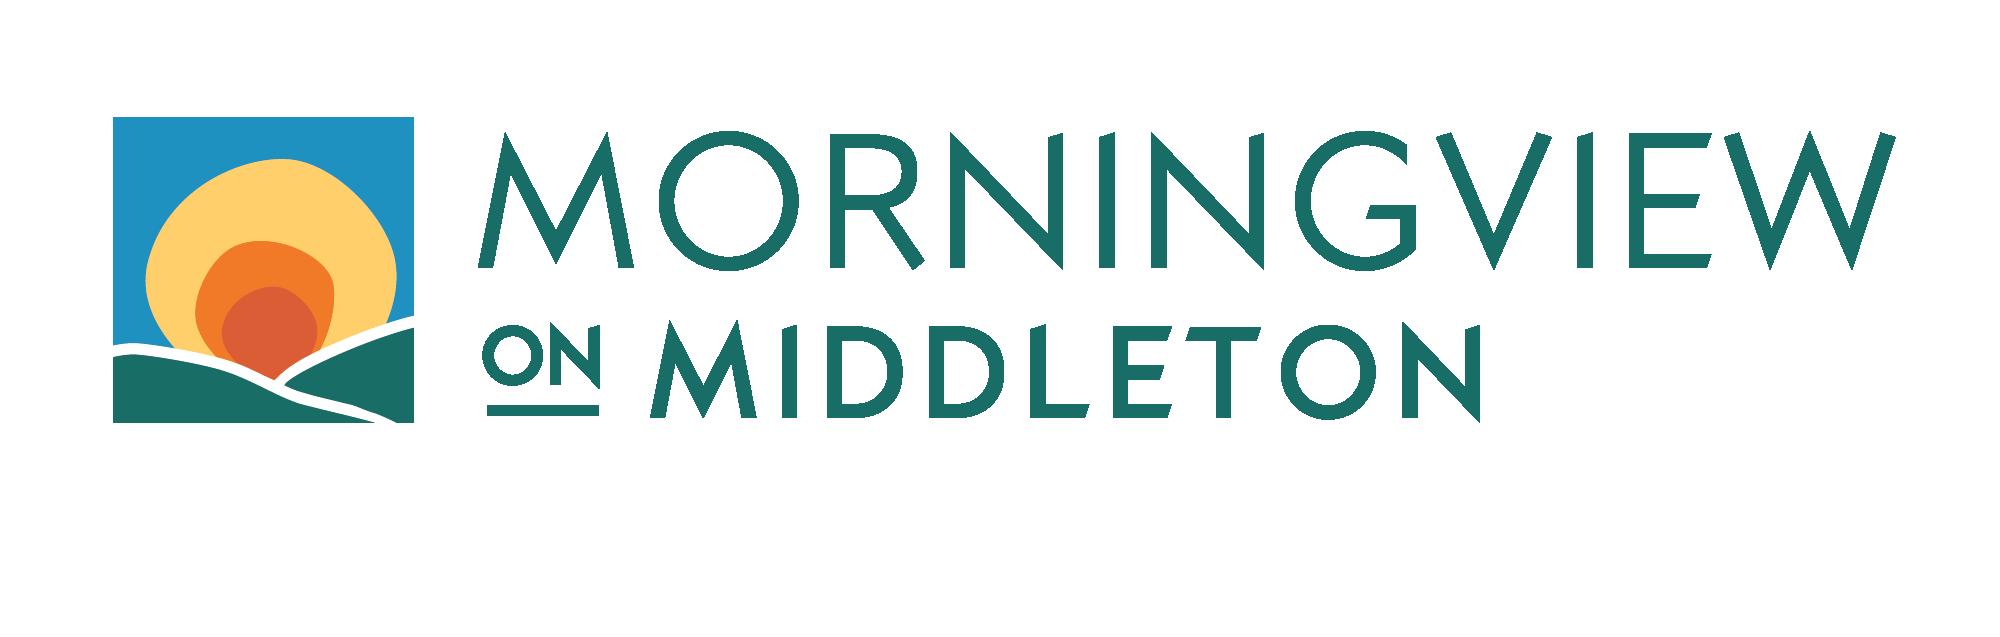 Morningview on Middleton - logo